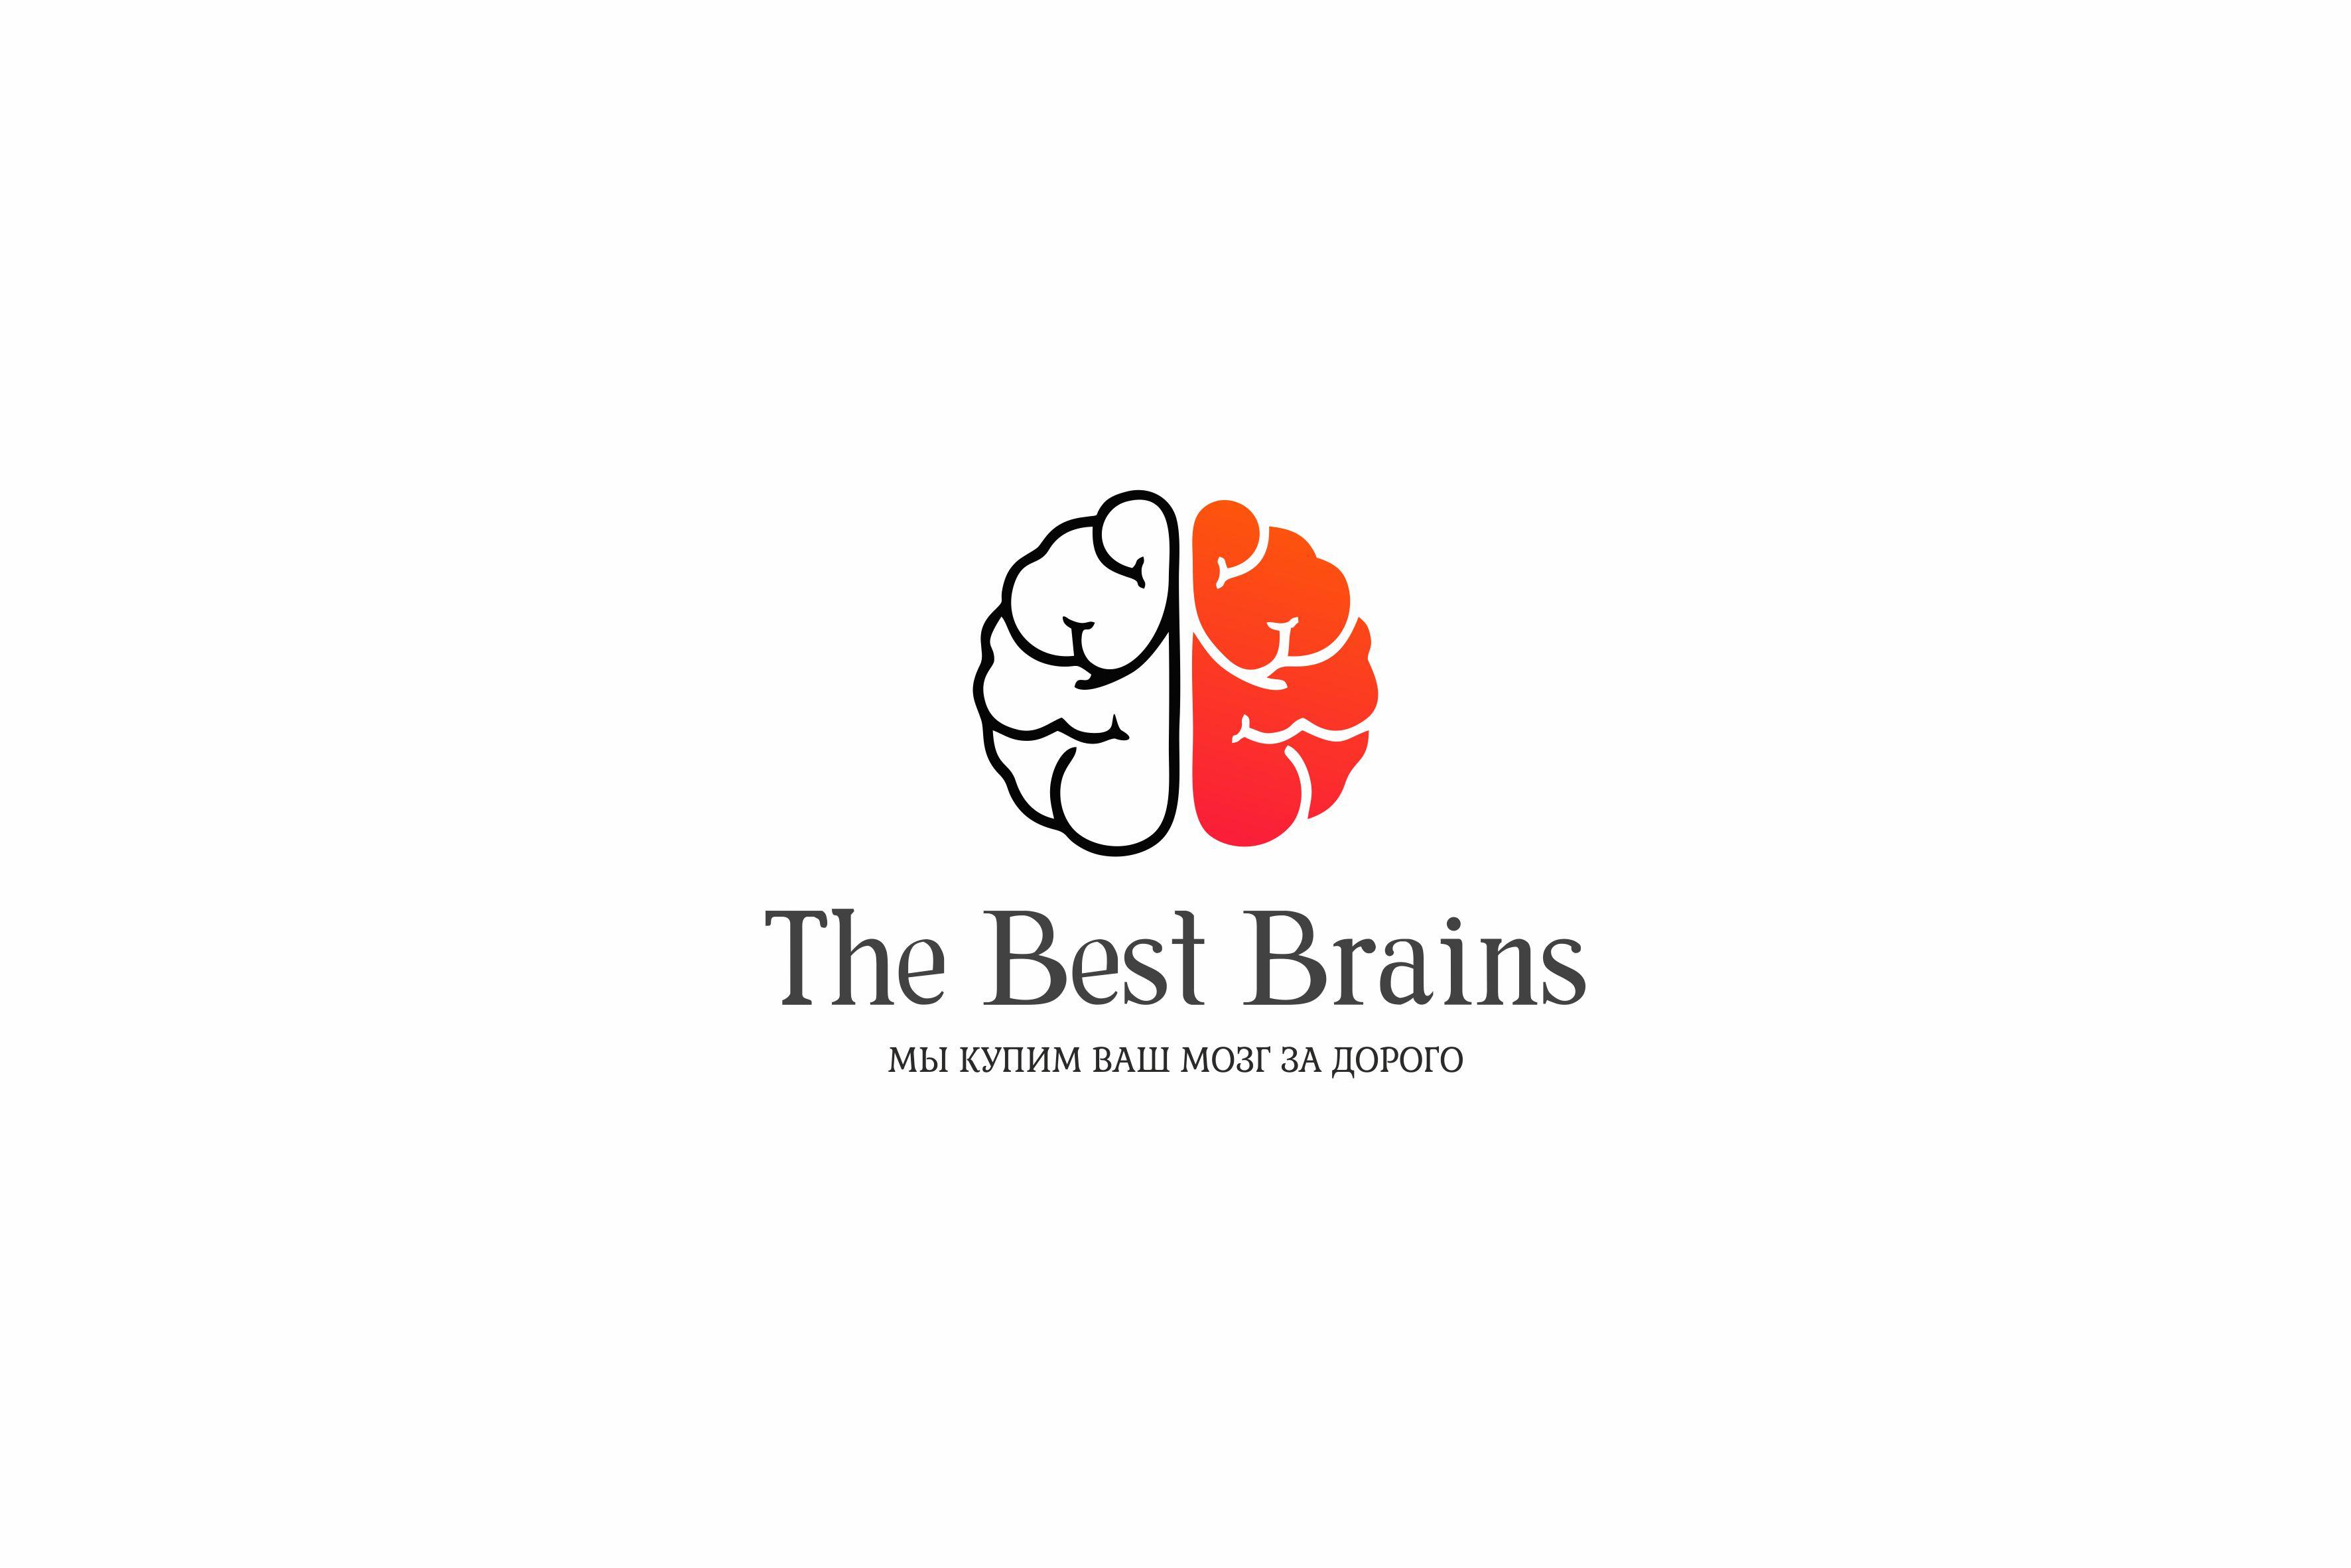 The Best Brains